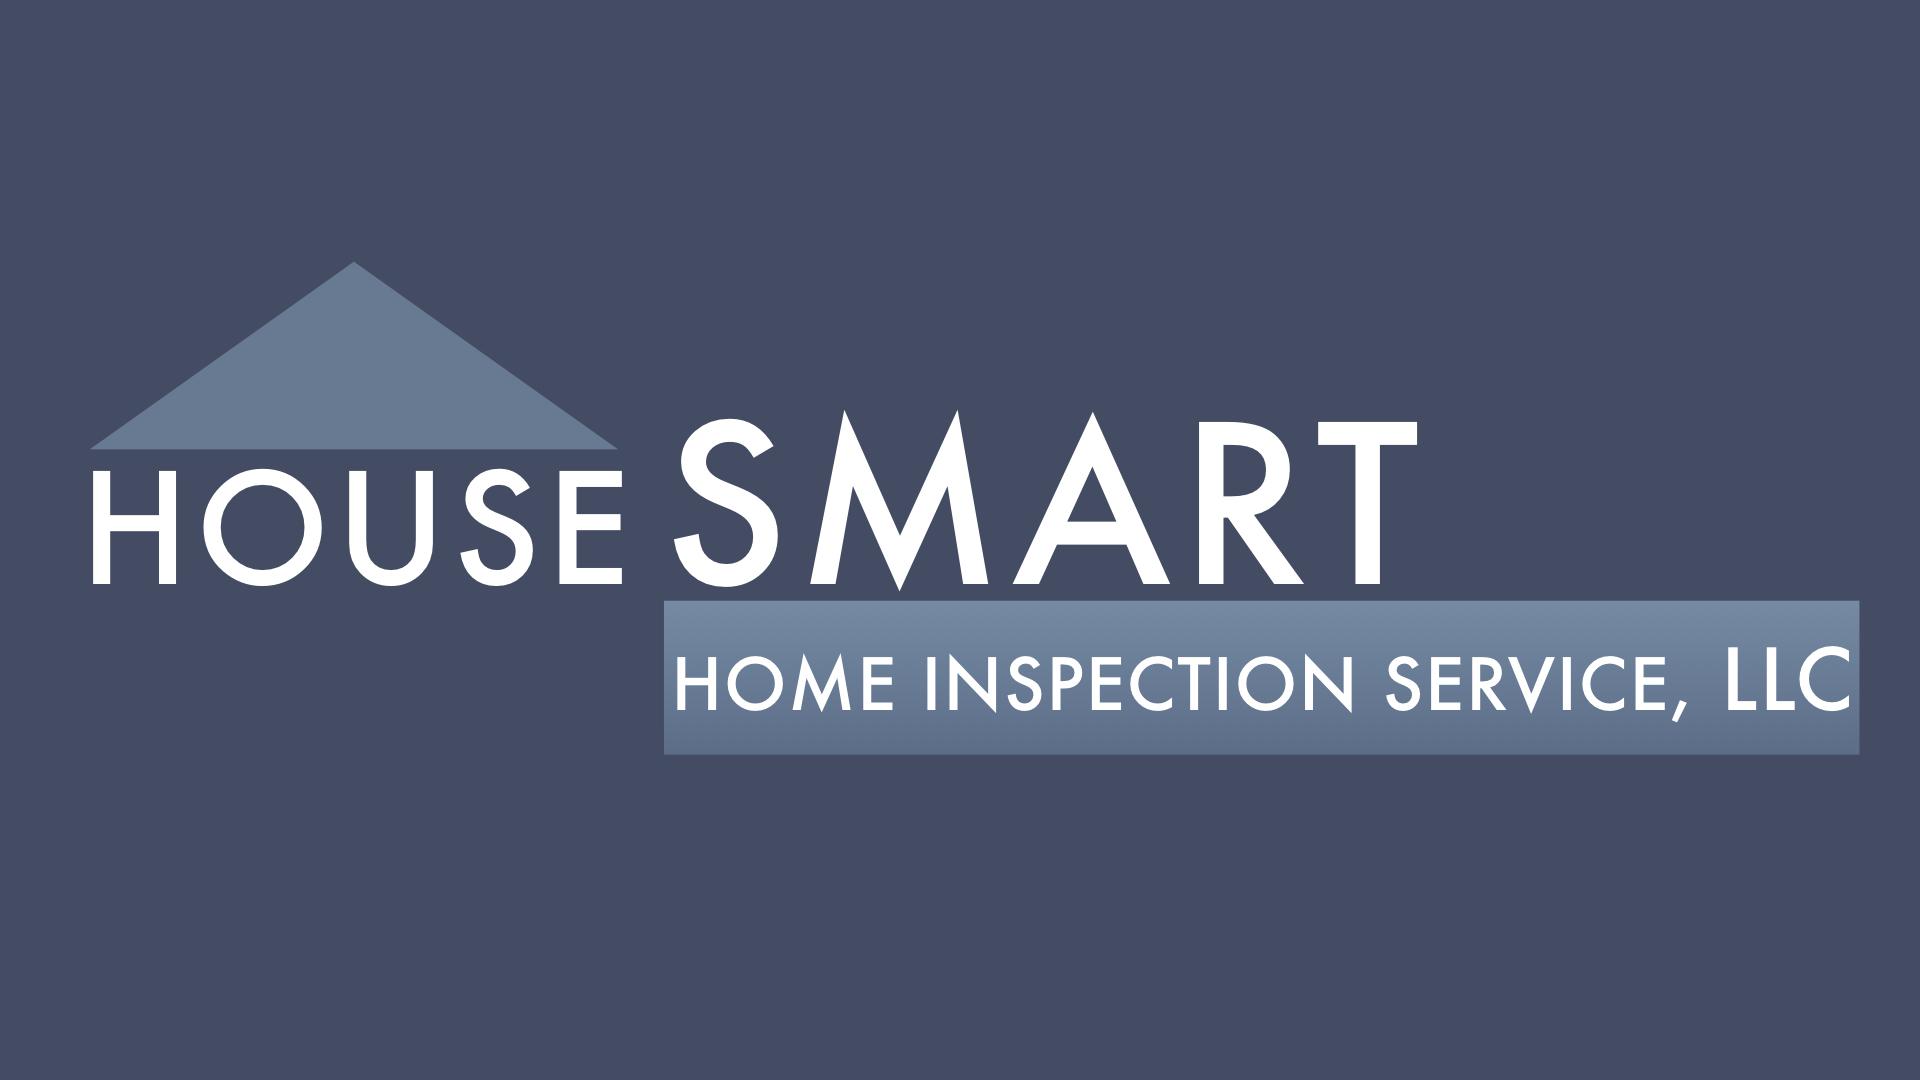 House smart home inspection logo widescreen.001